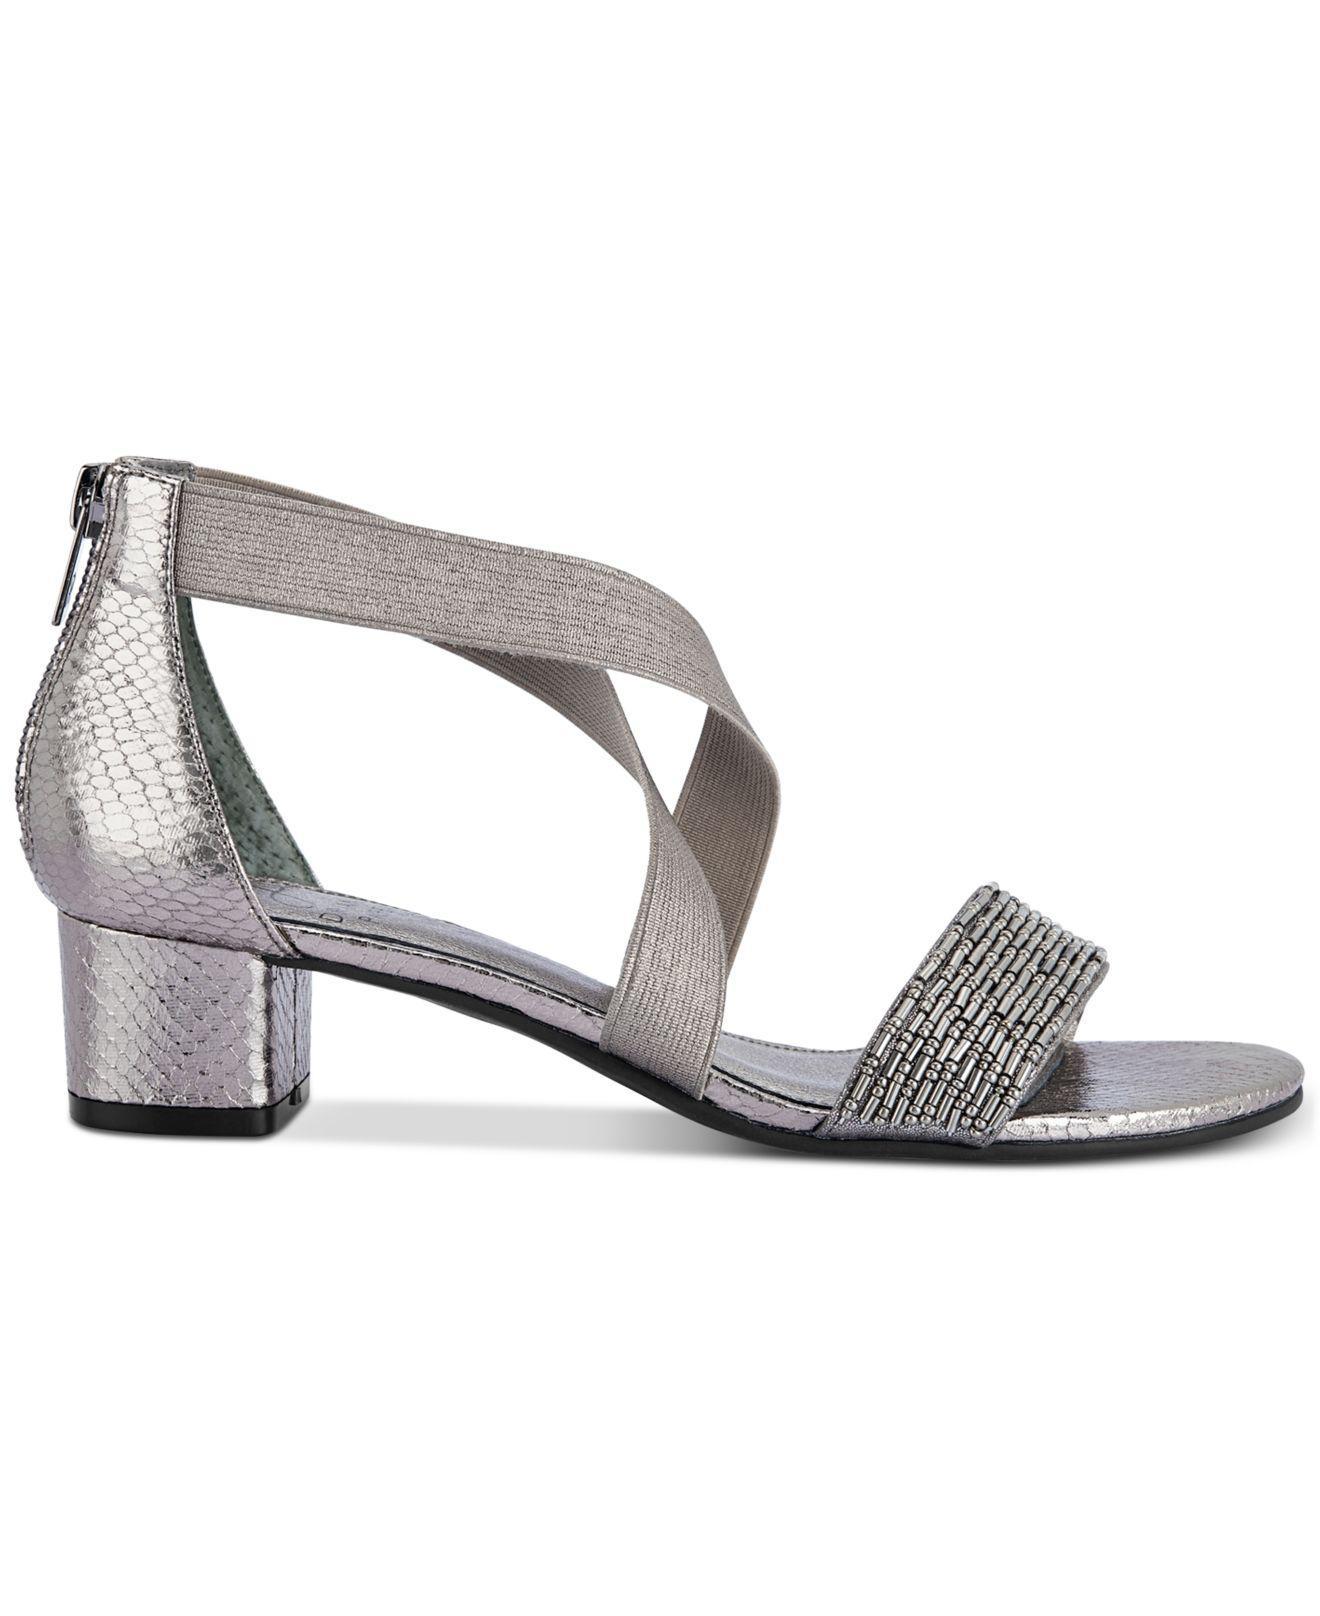 d6ad51937 Lyst - Adrianna Papell Teagan Evening Sandals